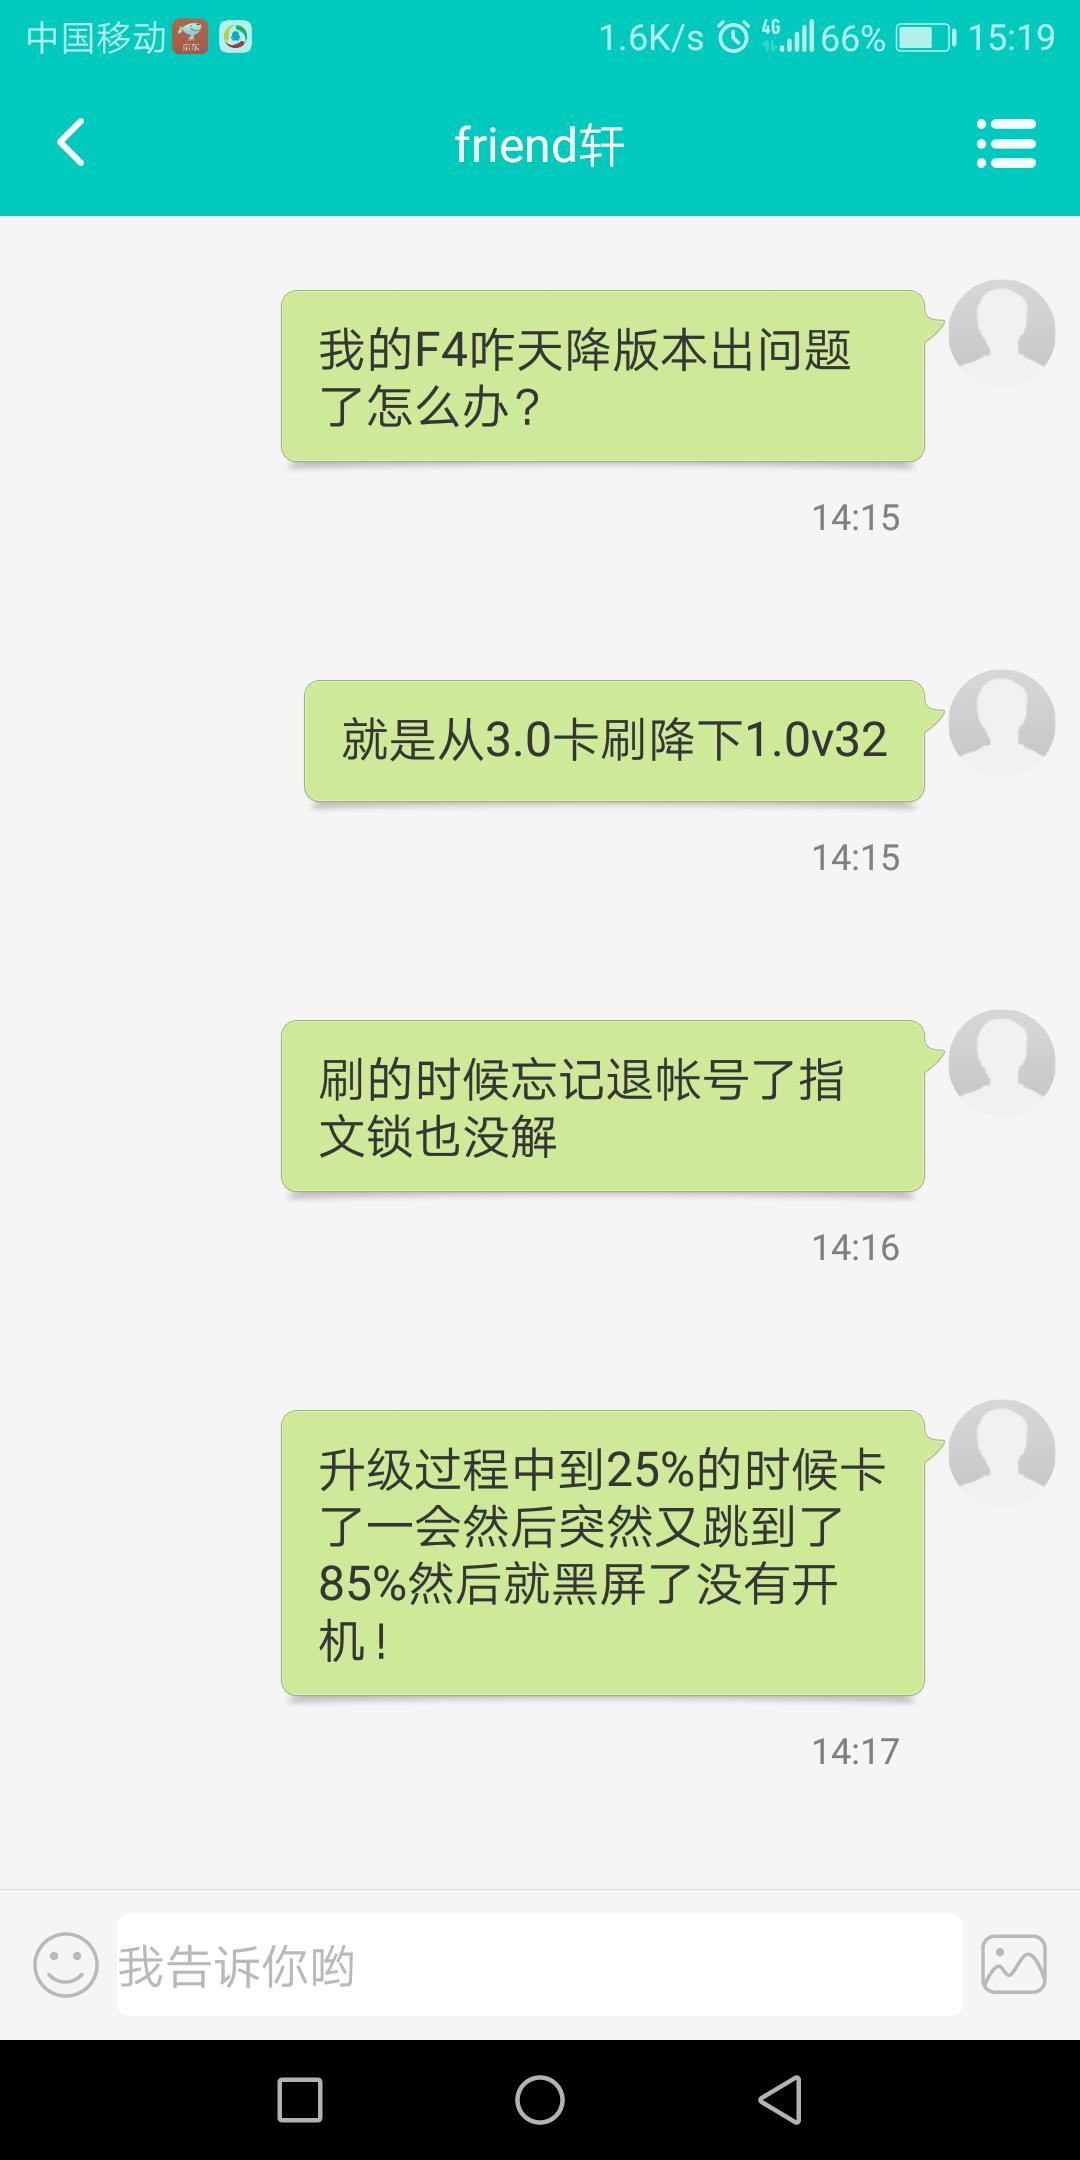 Screenshot_20181020-151931.png